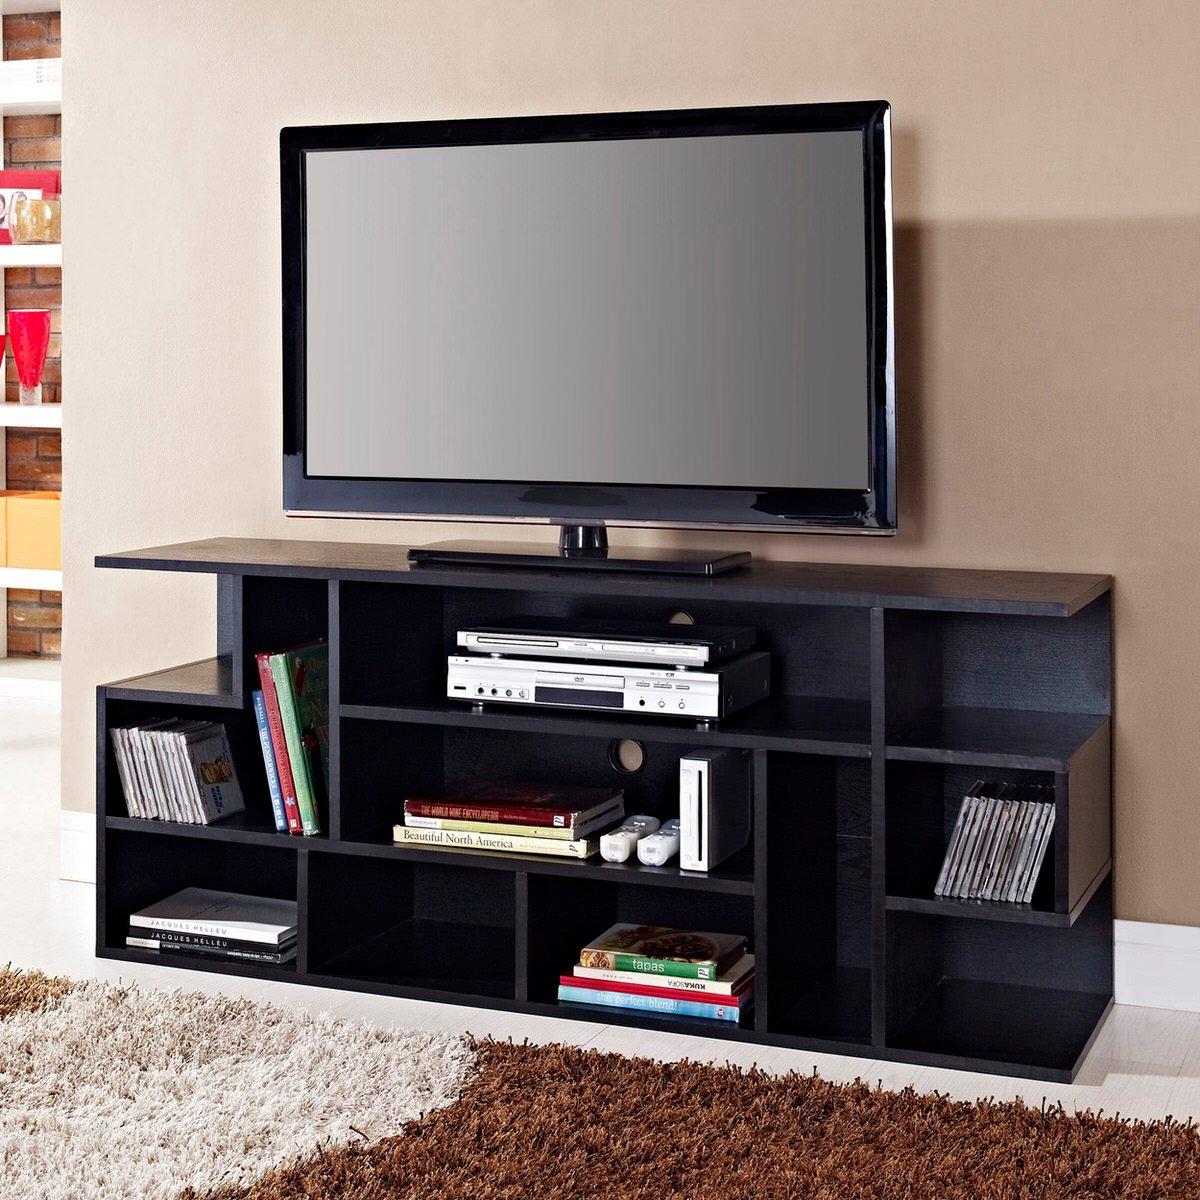 modstyle 60 inch tv console black by walker edison. Black Bedroom Furniture Sets. Home Design Ideas